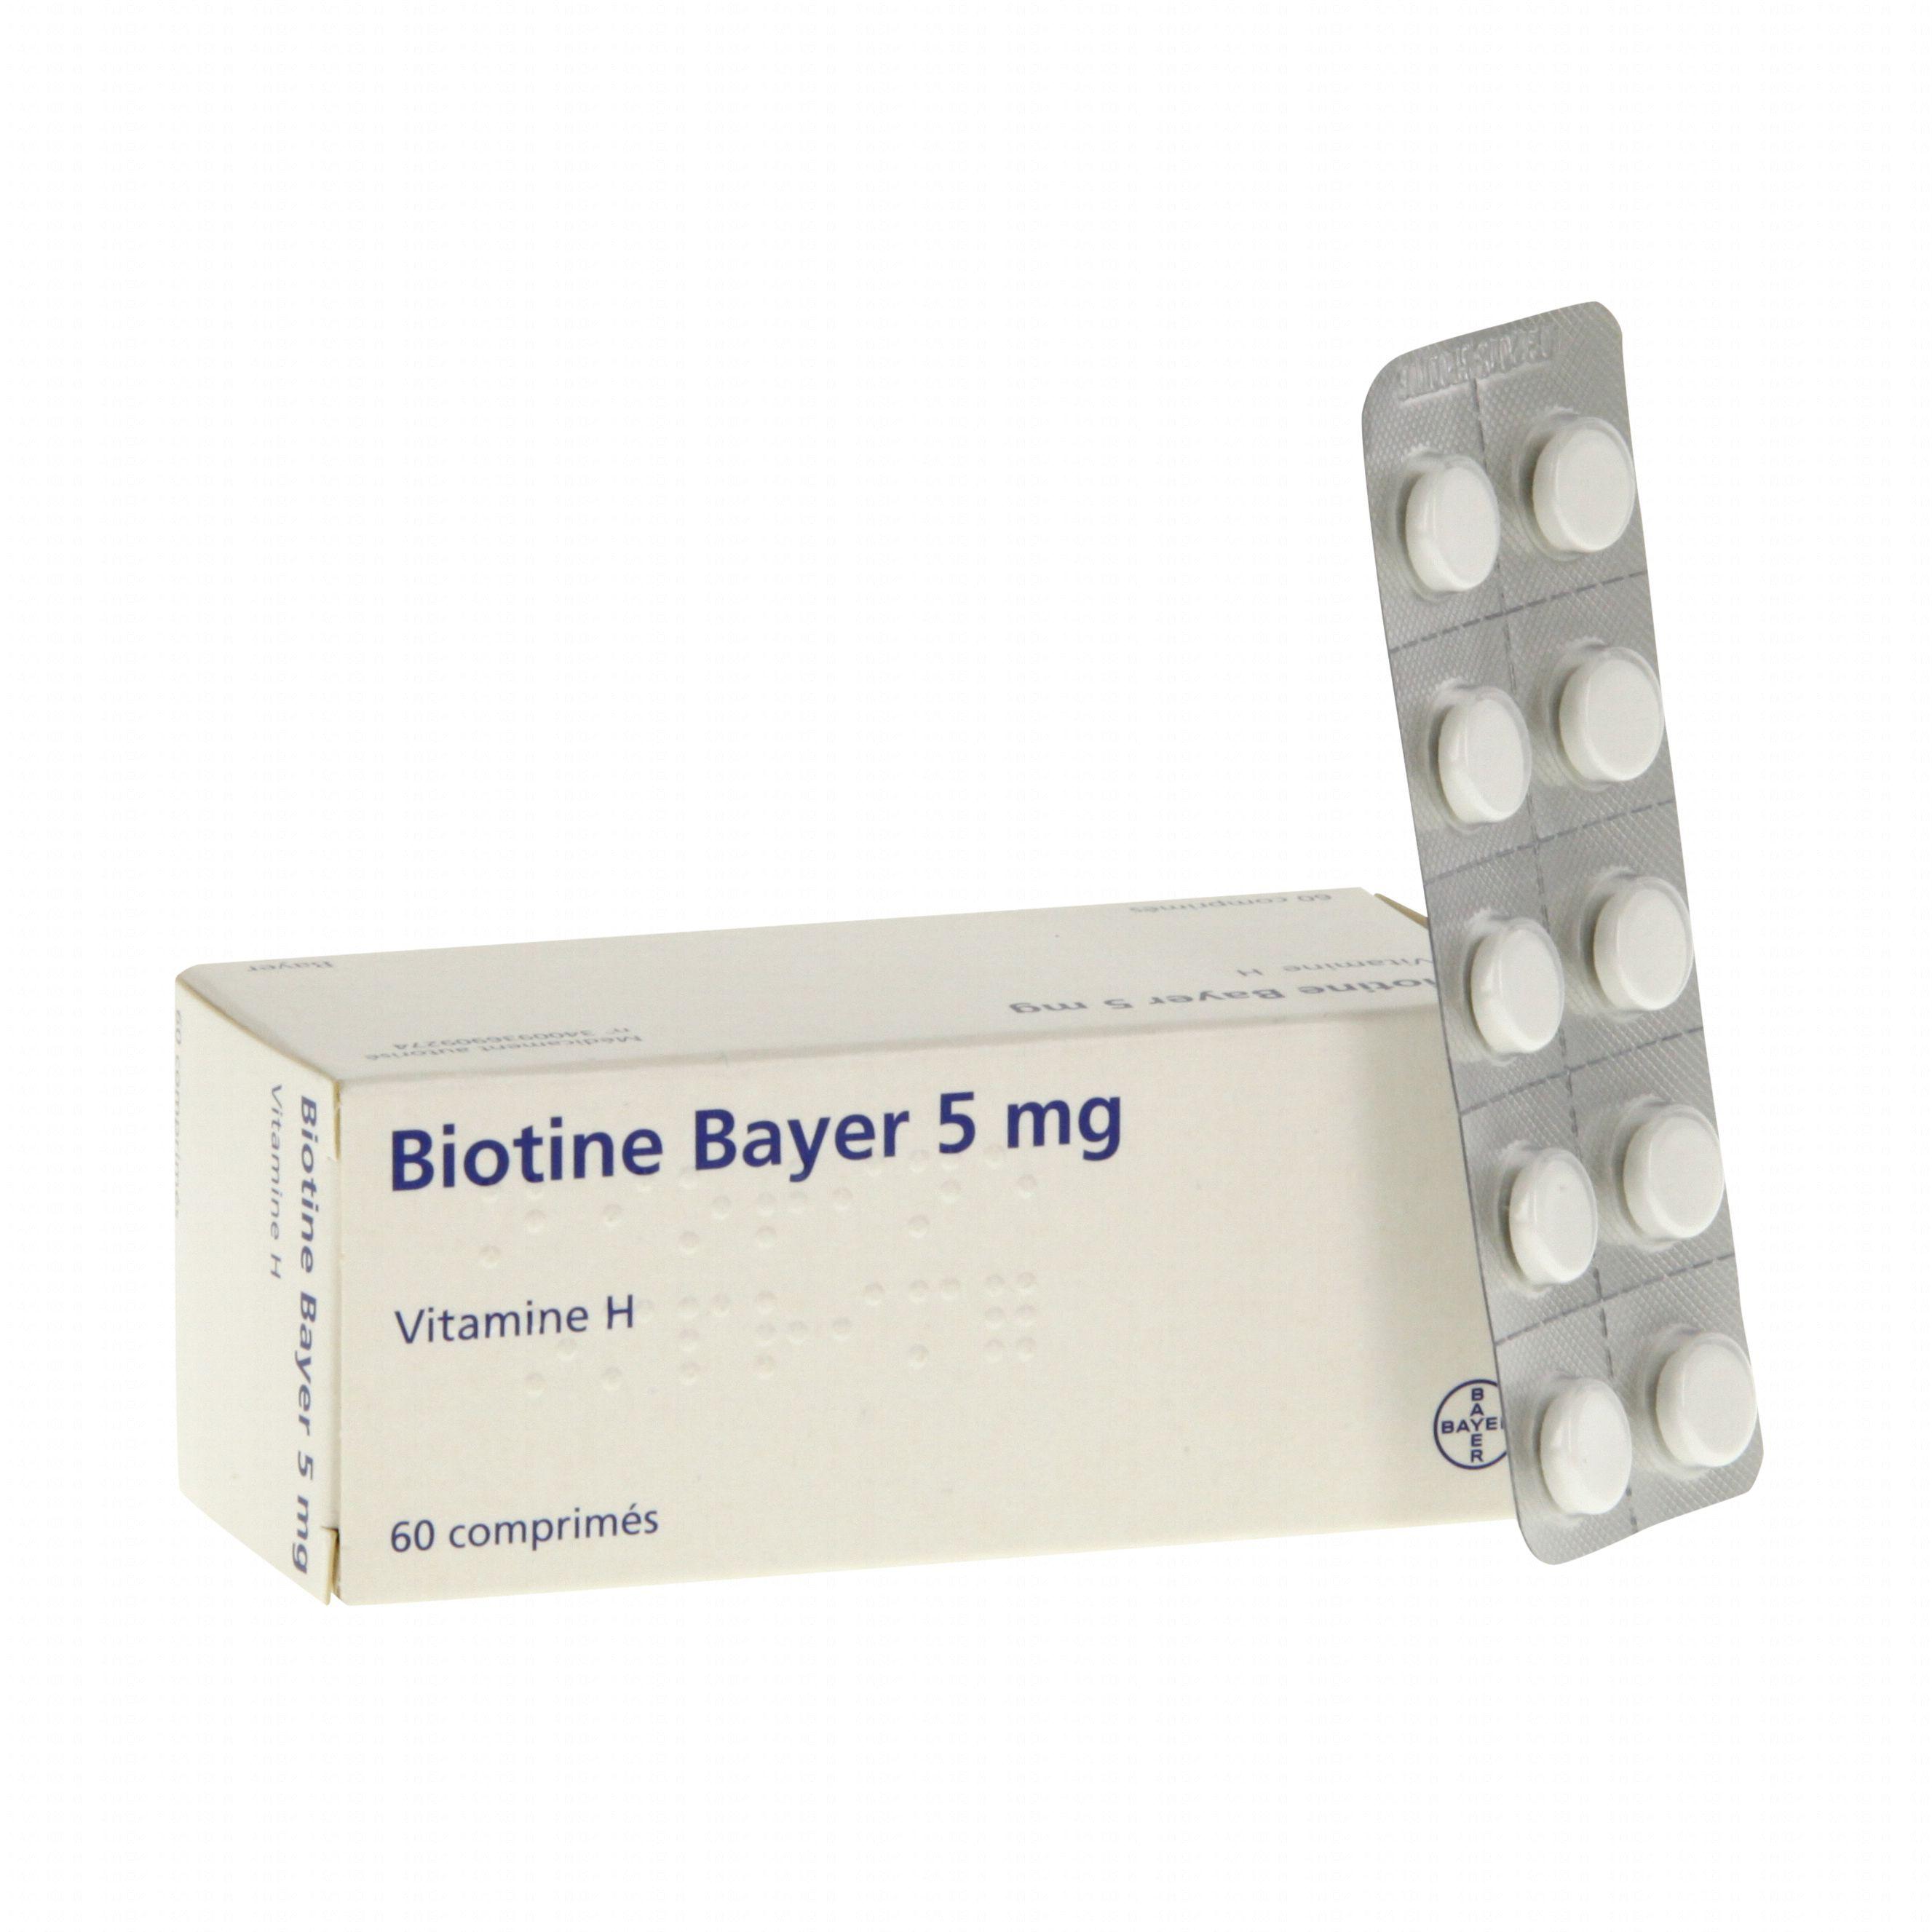 Biotine bayer 5 mg boîte de 60 comprimés (médicament